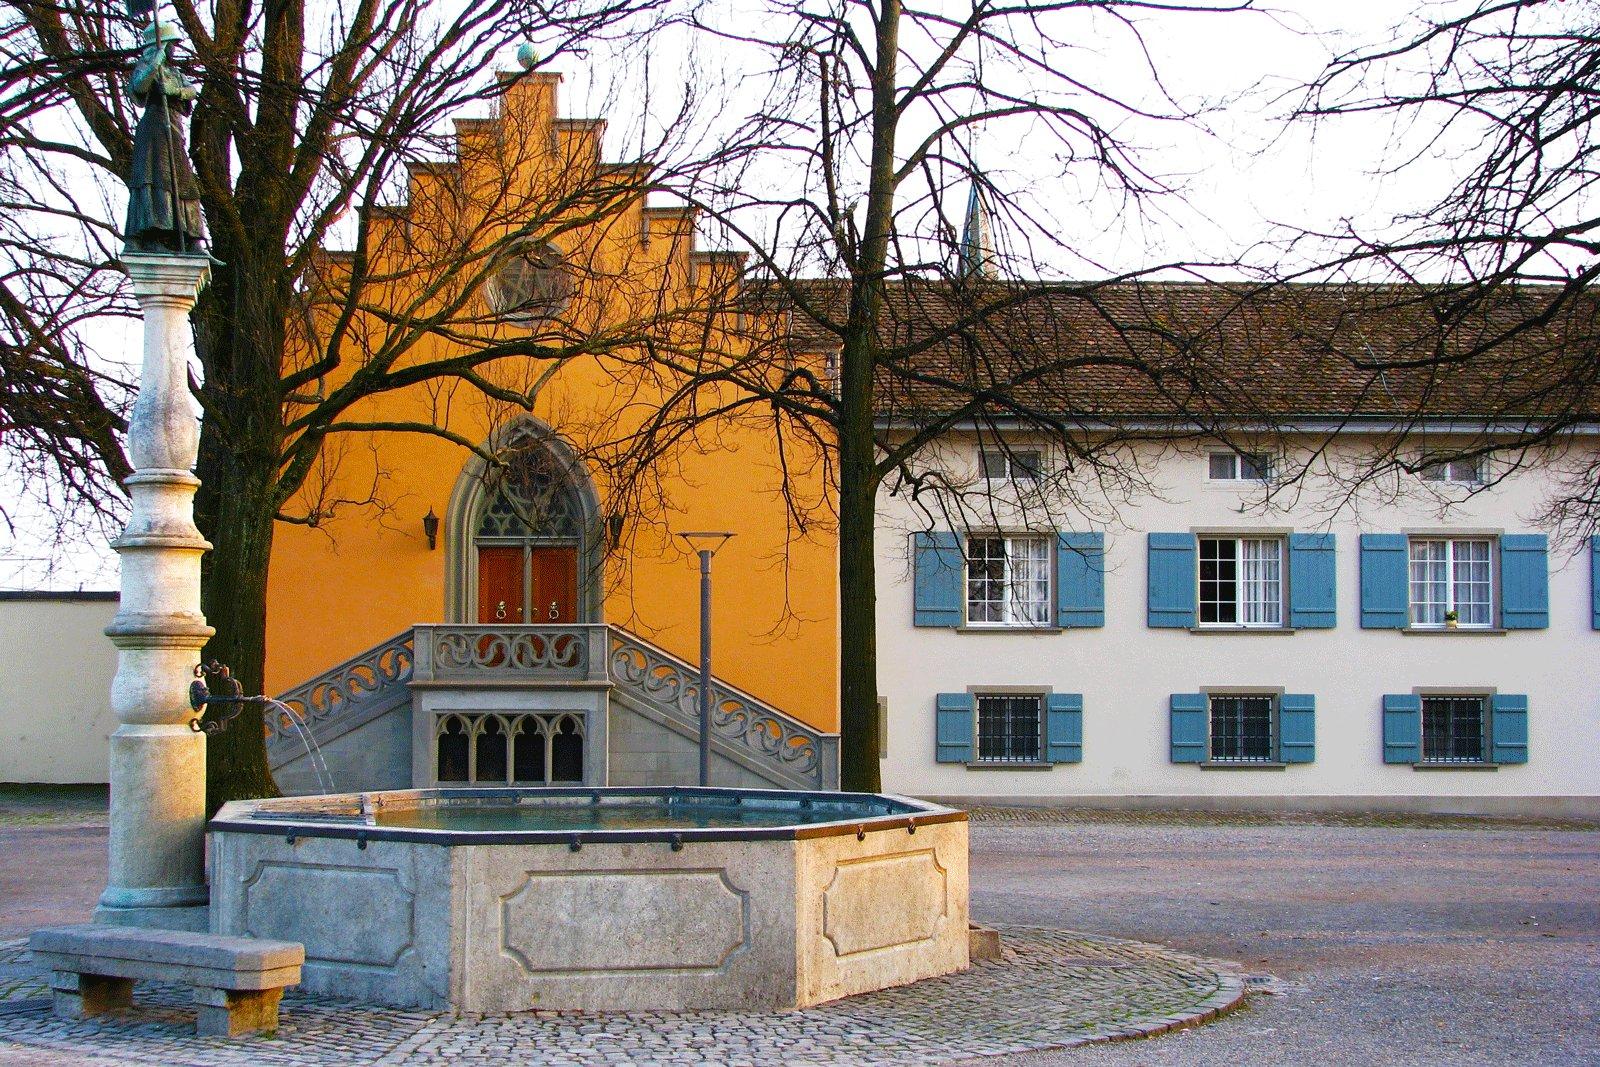 How to visit Freemason lodge in Zurich